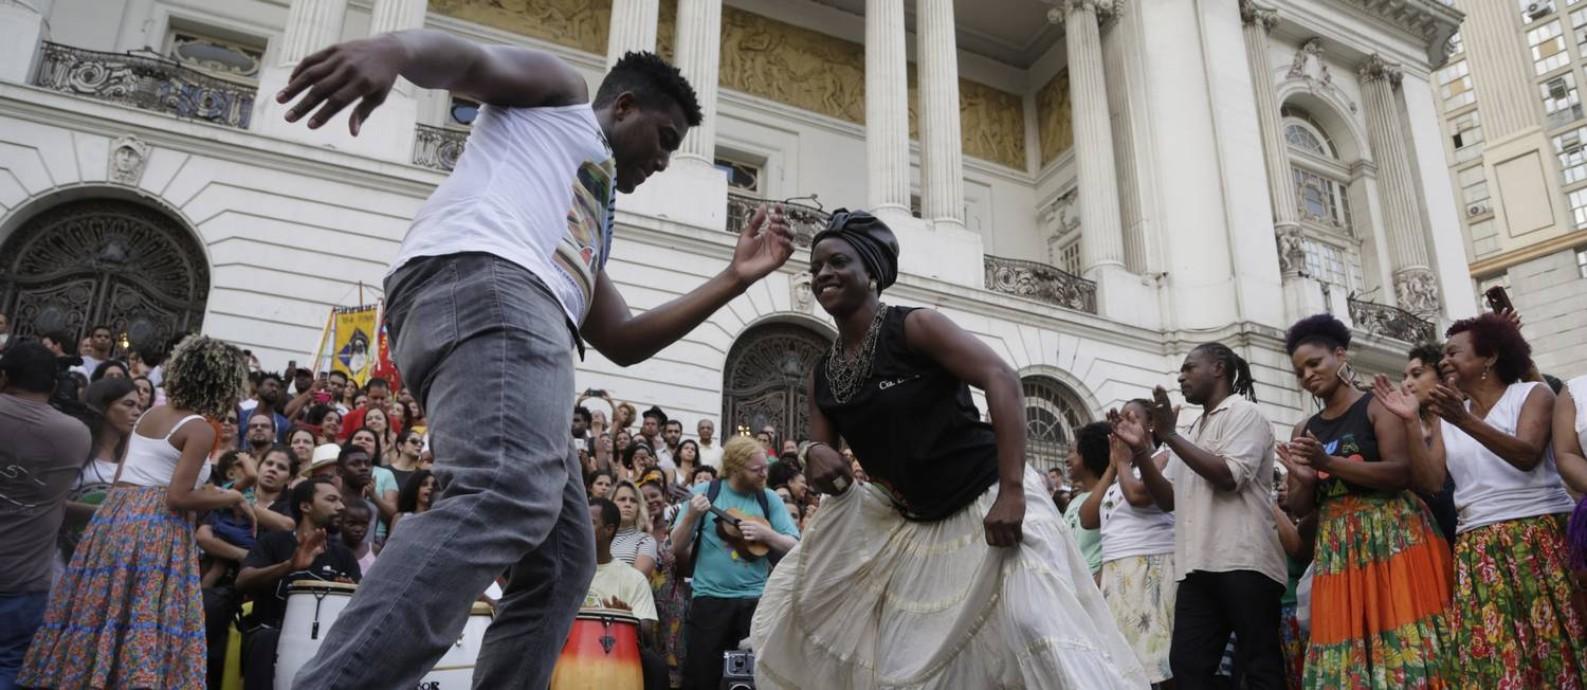 Protesto de grupos contra o fechamento da Casa do Jongo na Cinelândia Foto: Gustavo Miranda / Agência O Globo